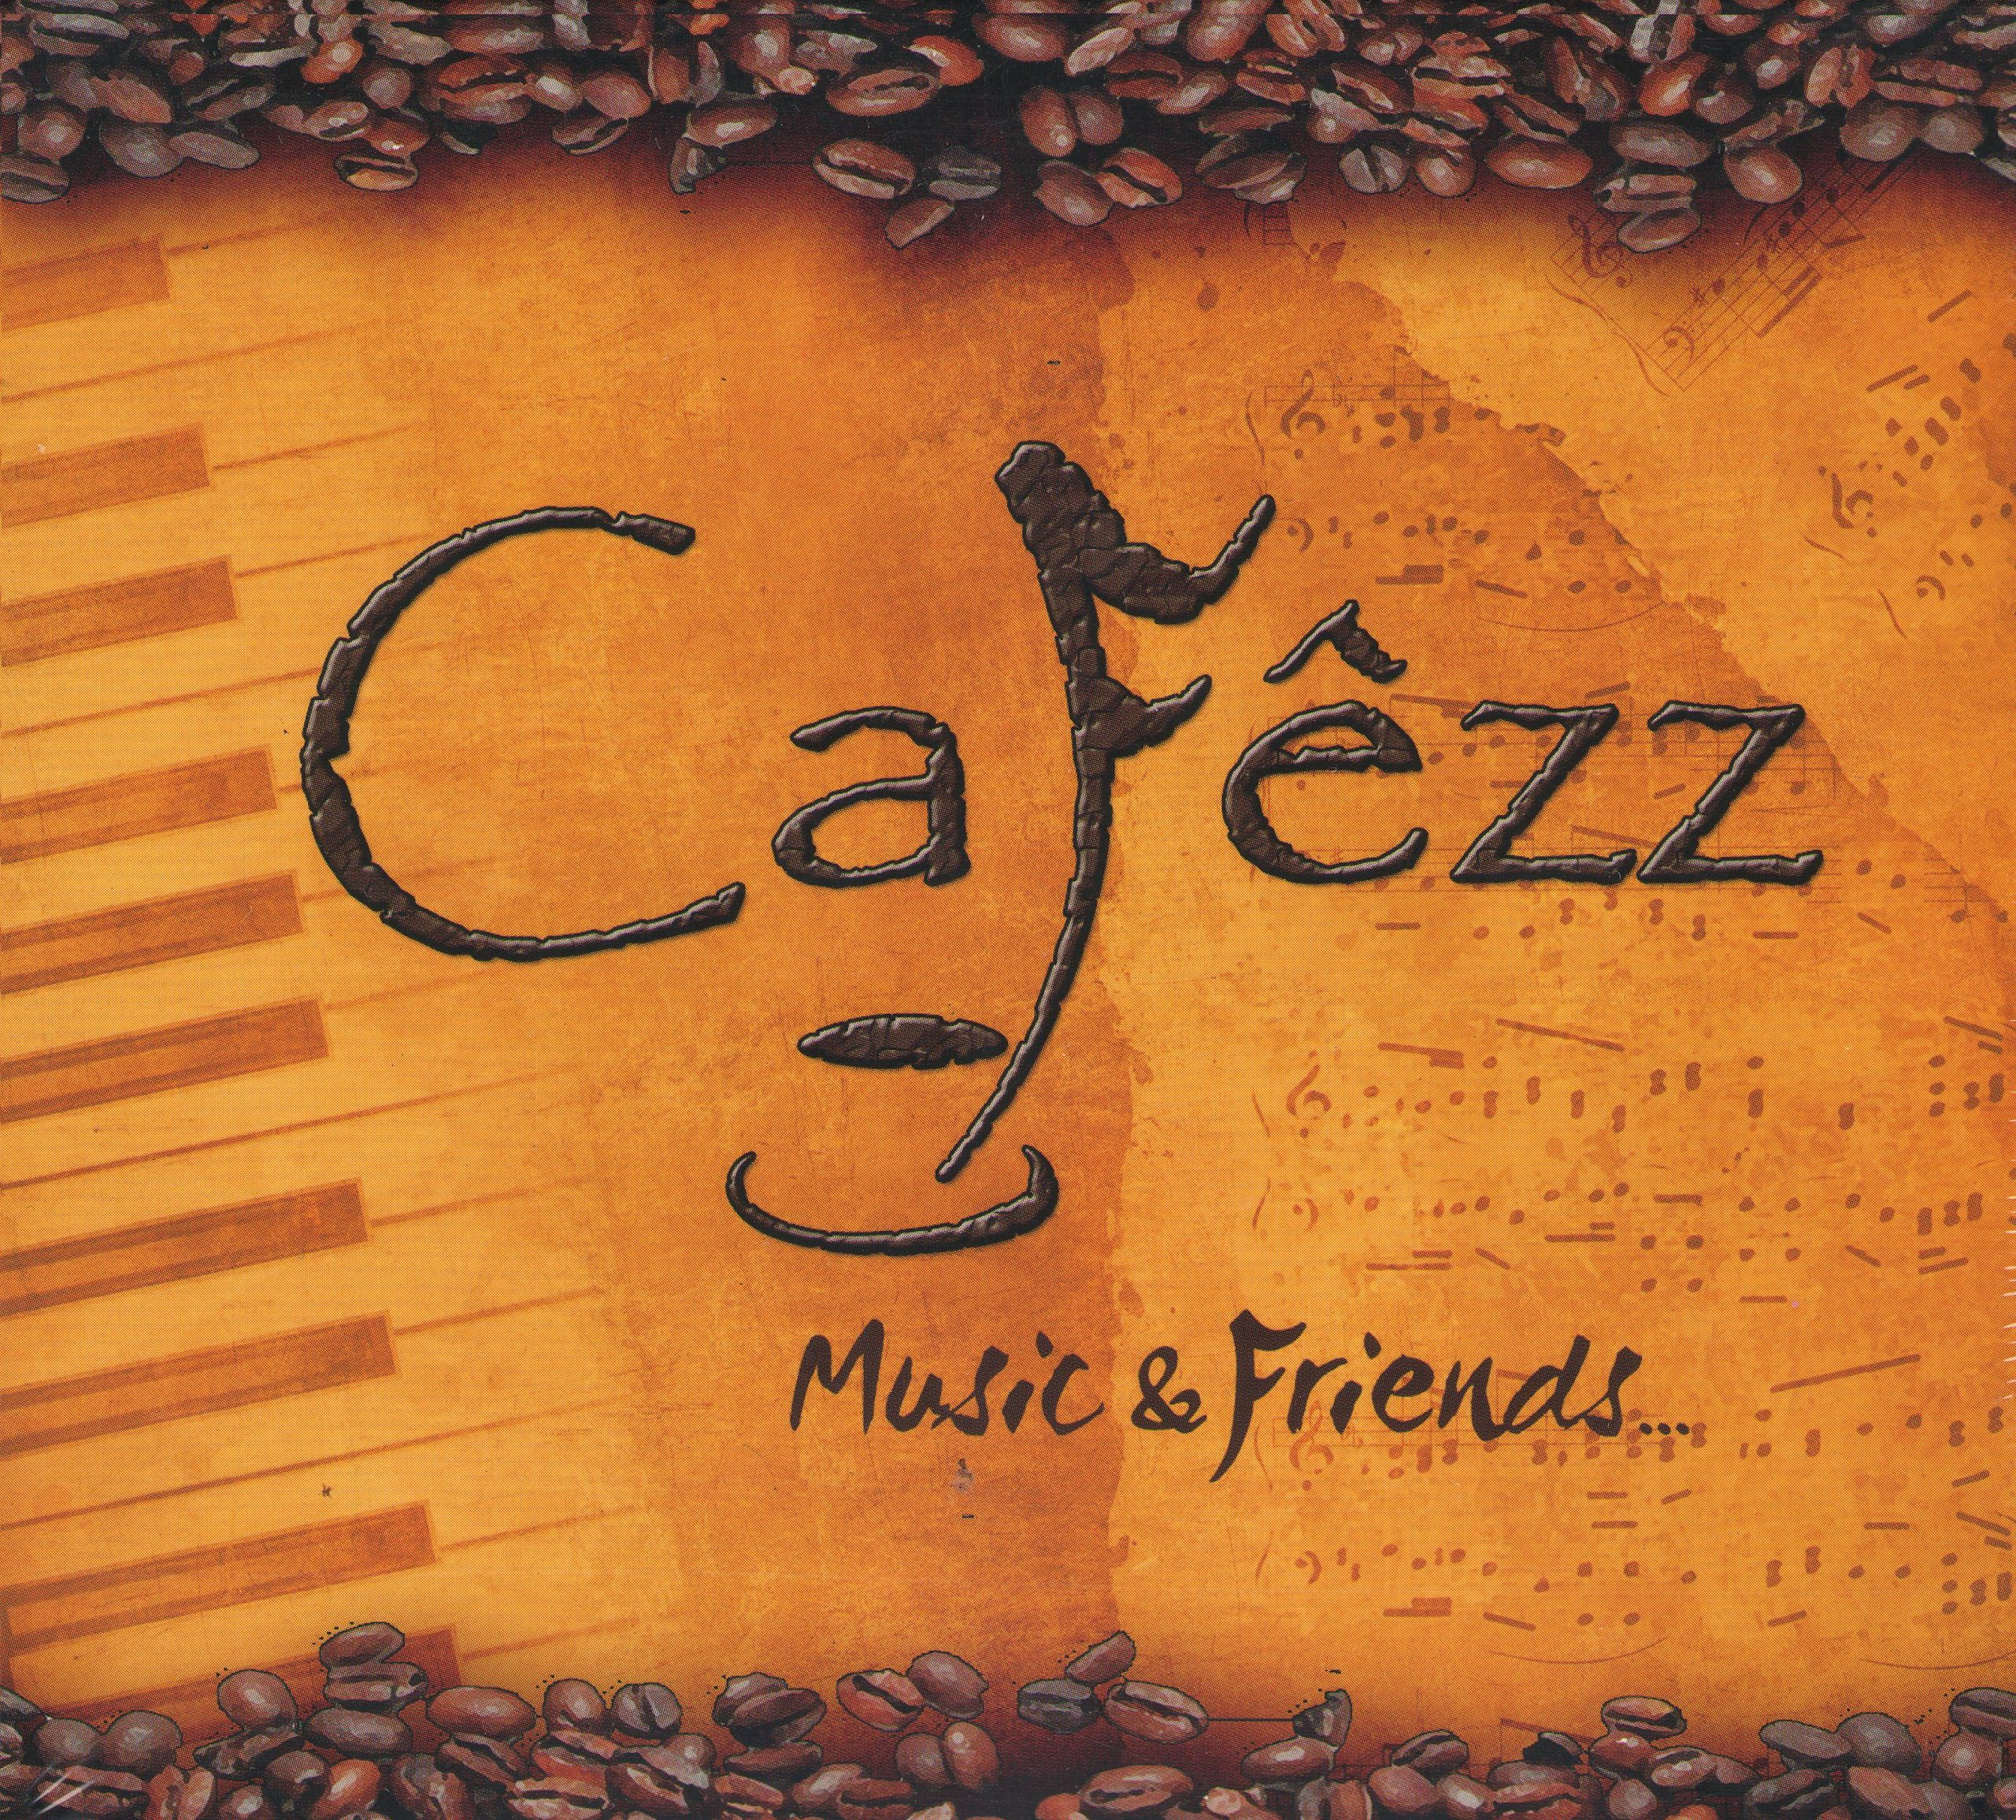 19. Cafezz Music & Friends